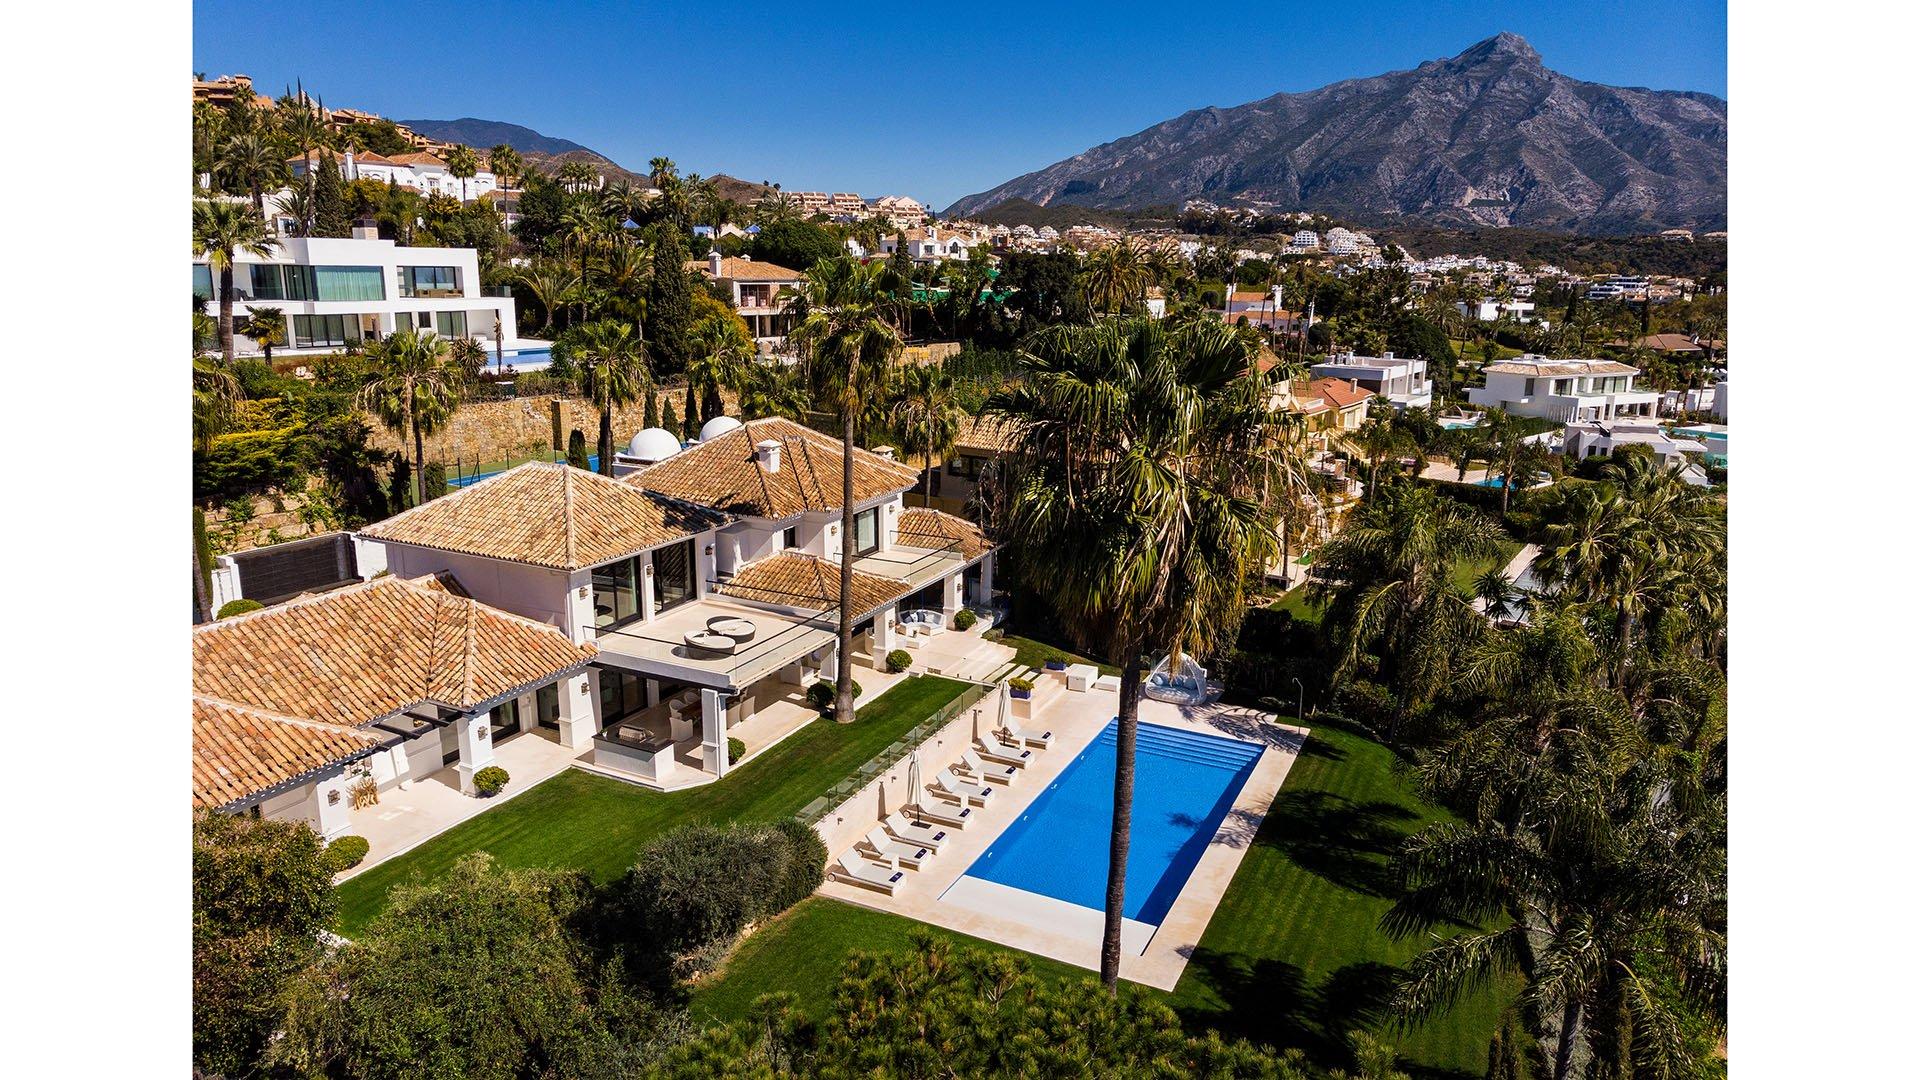 La Cerquilla 30: Stunning villa in the heart of the Golf Valley in Marbella